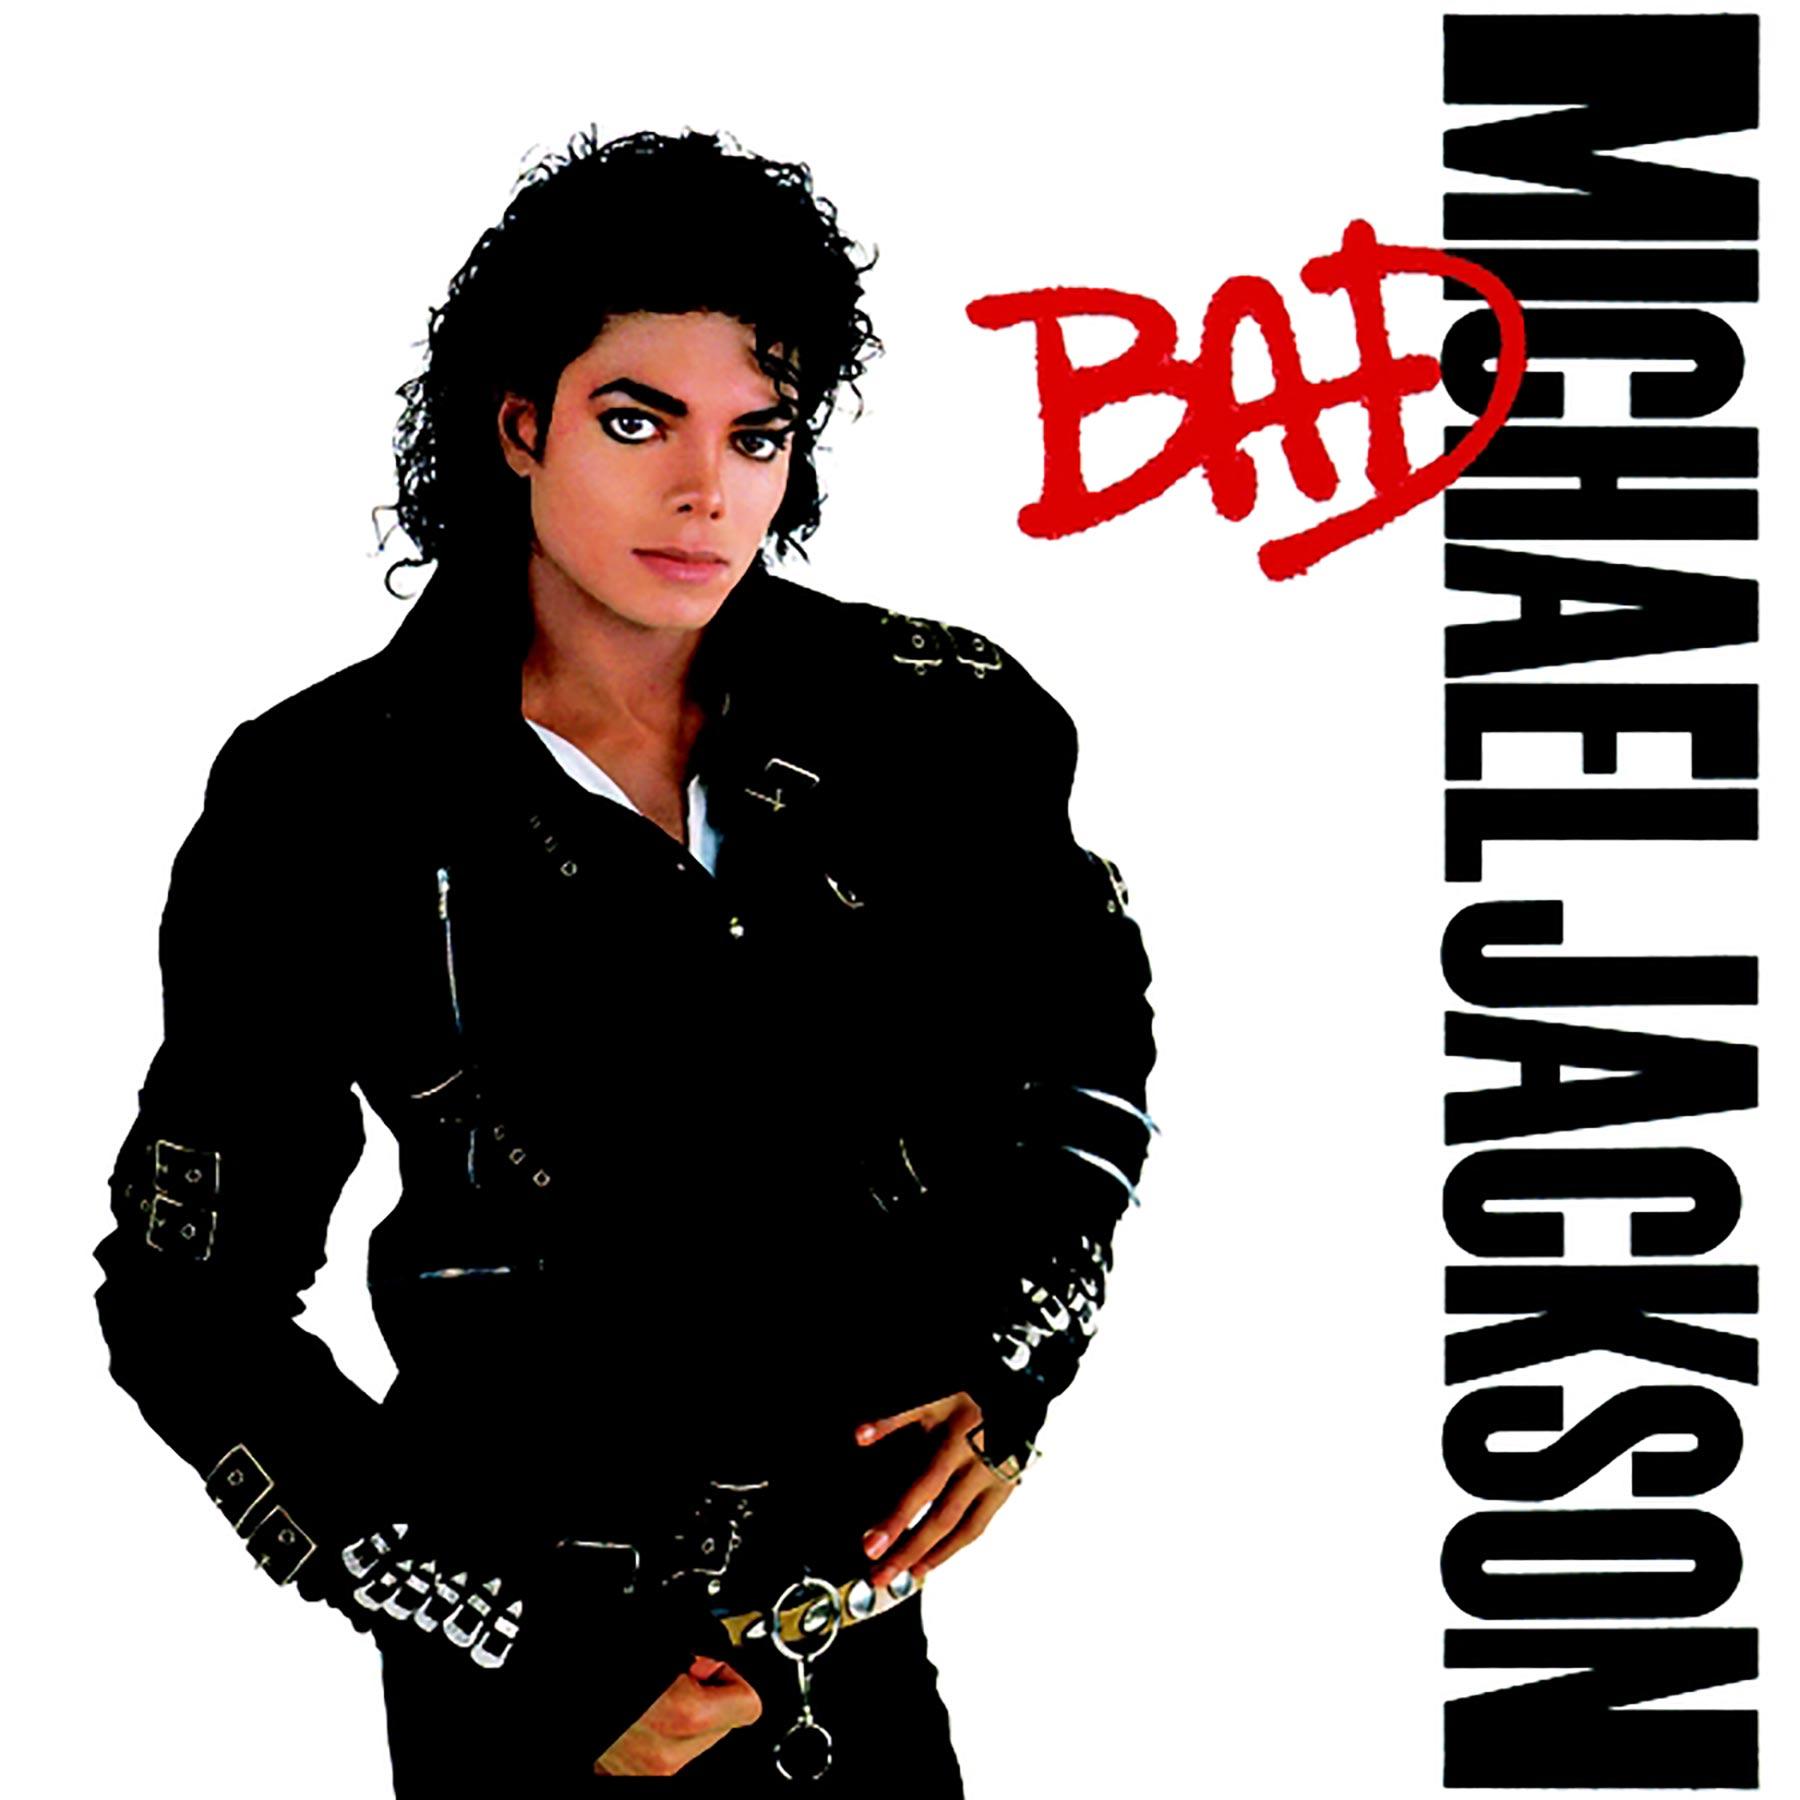 Bad by Michael Jackson1987